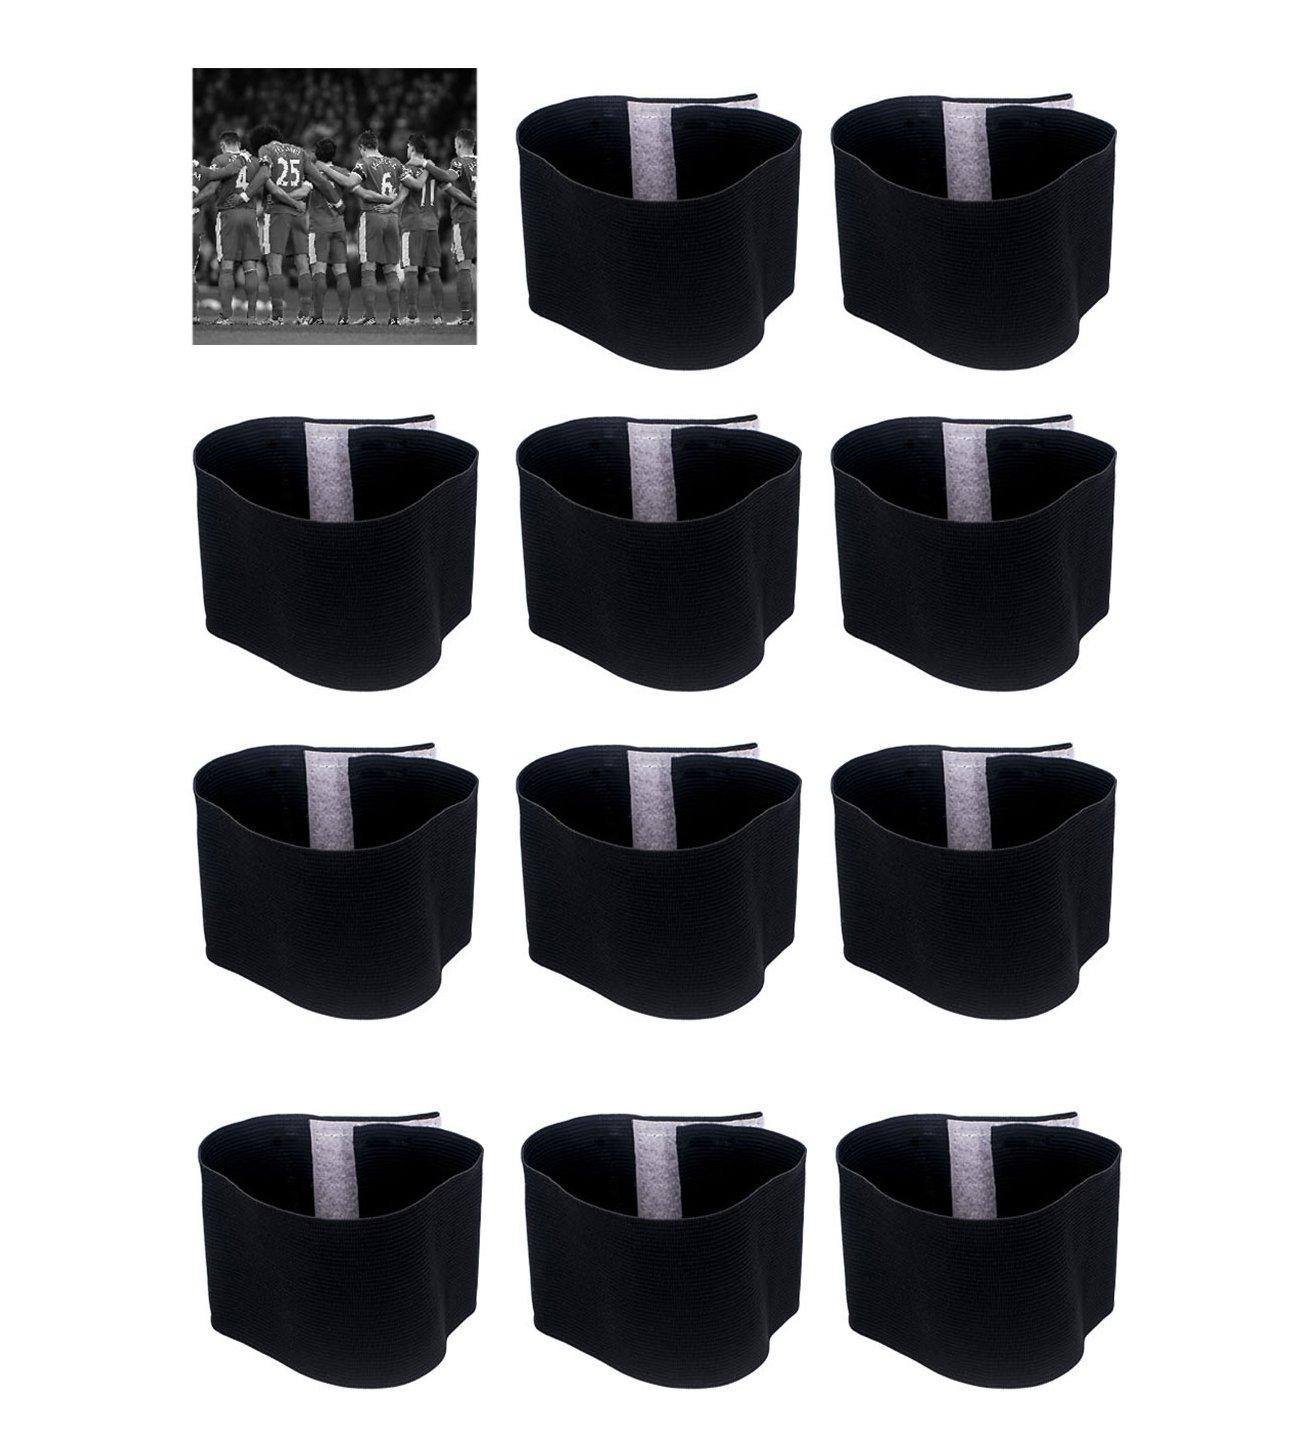 Wrzbest Black Mourning Band Soccer Football Mourning Armband,Elacstic Adjustable Funeral Armband by Wrzbest